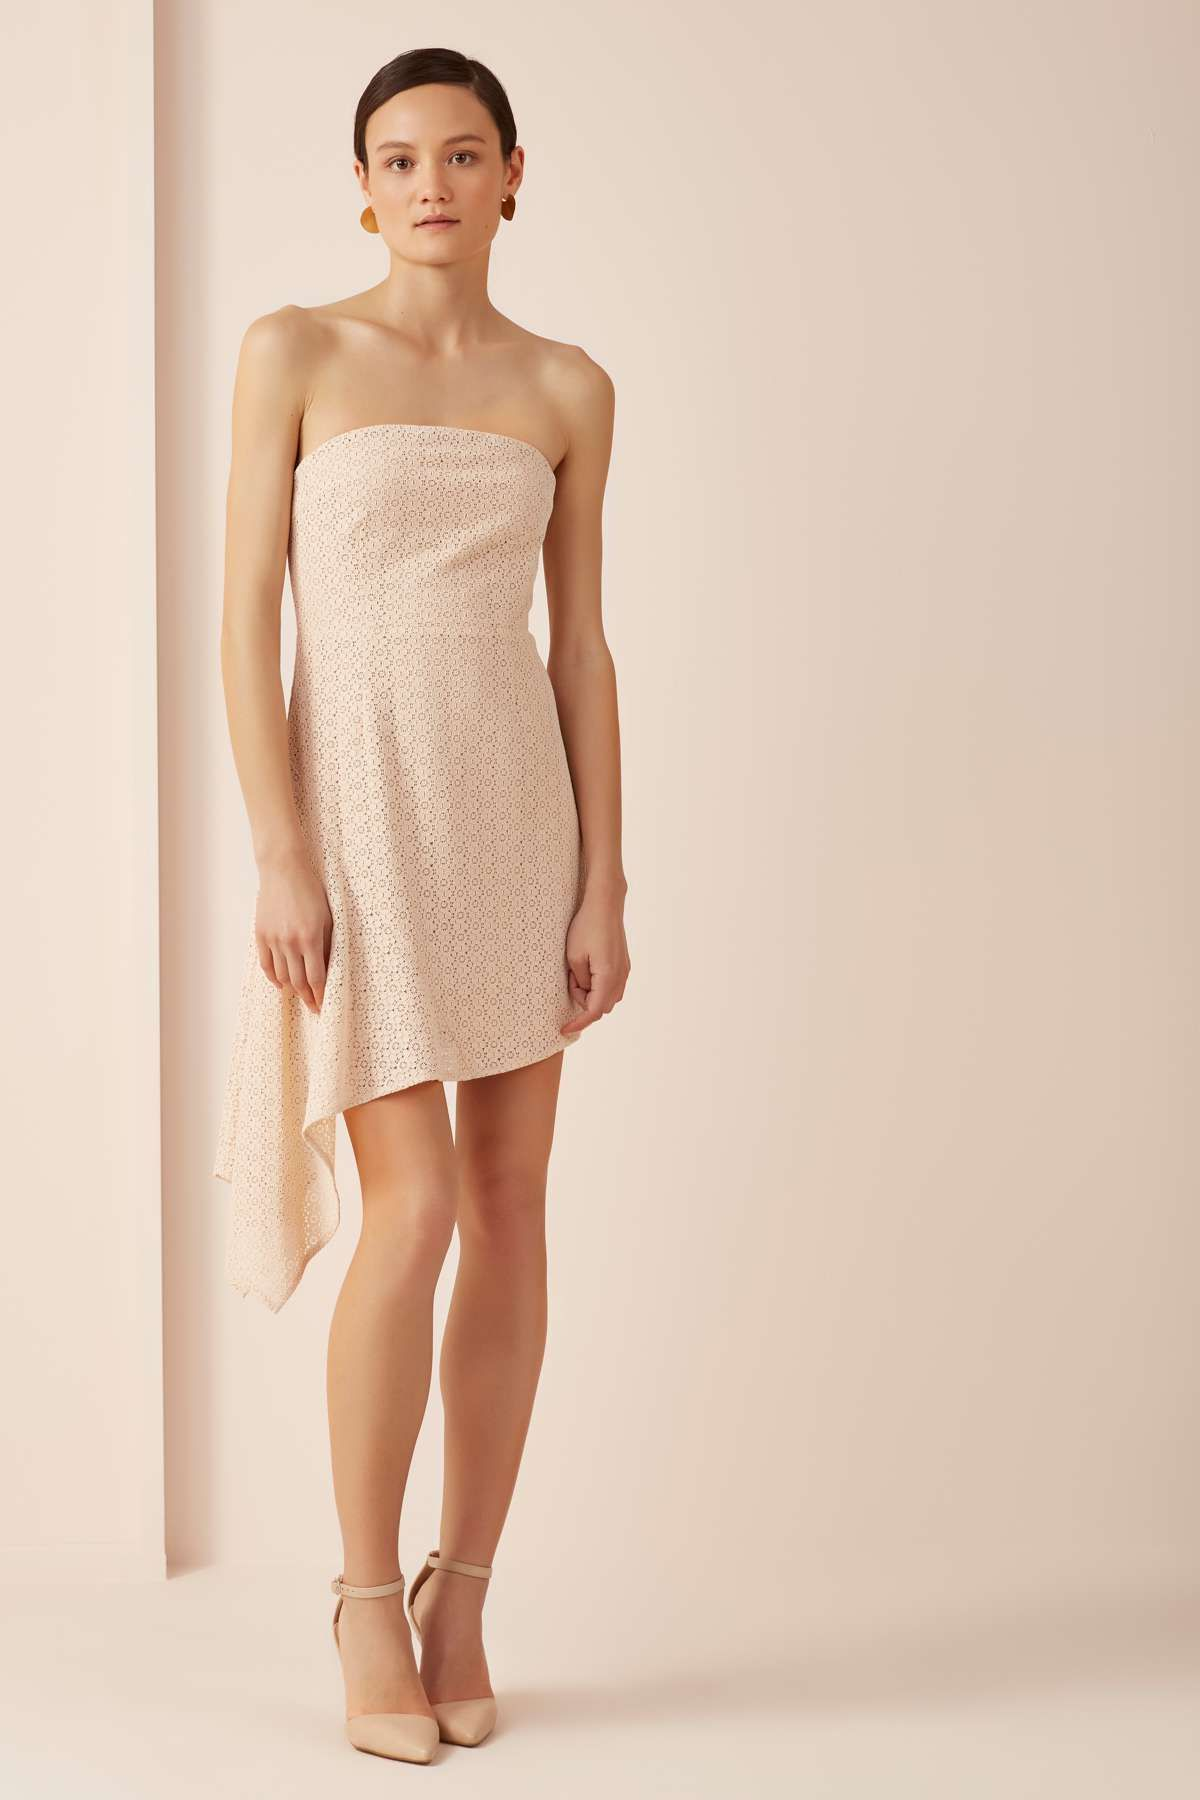 51edd8272 Women's Boutique Clothing & Fashion Online - Princess Polly